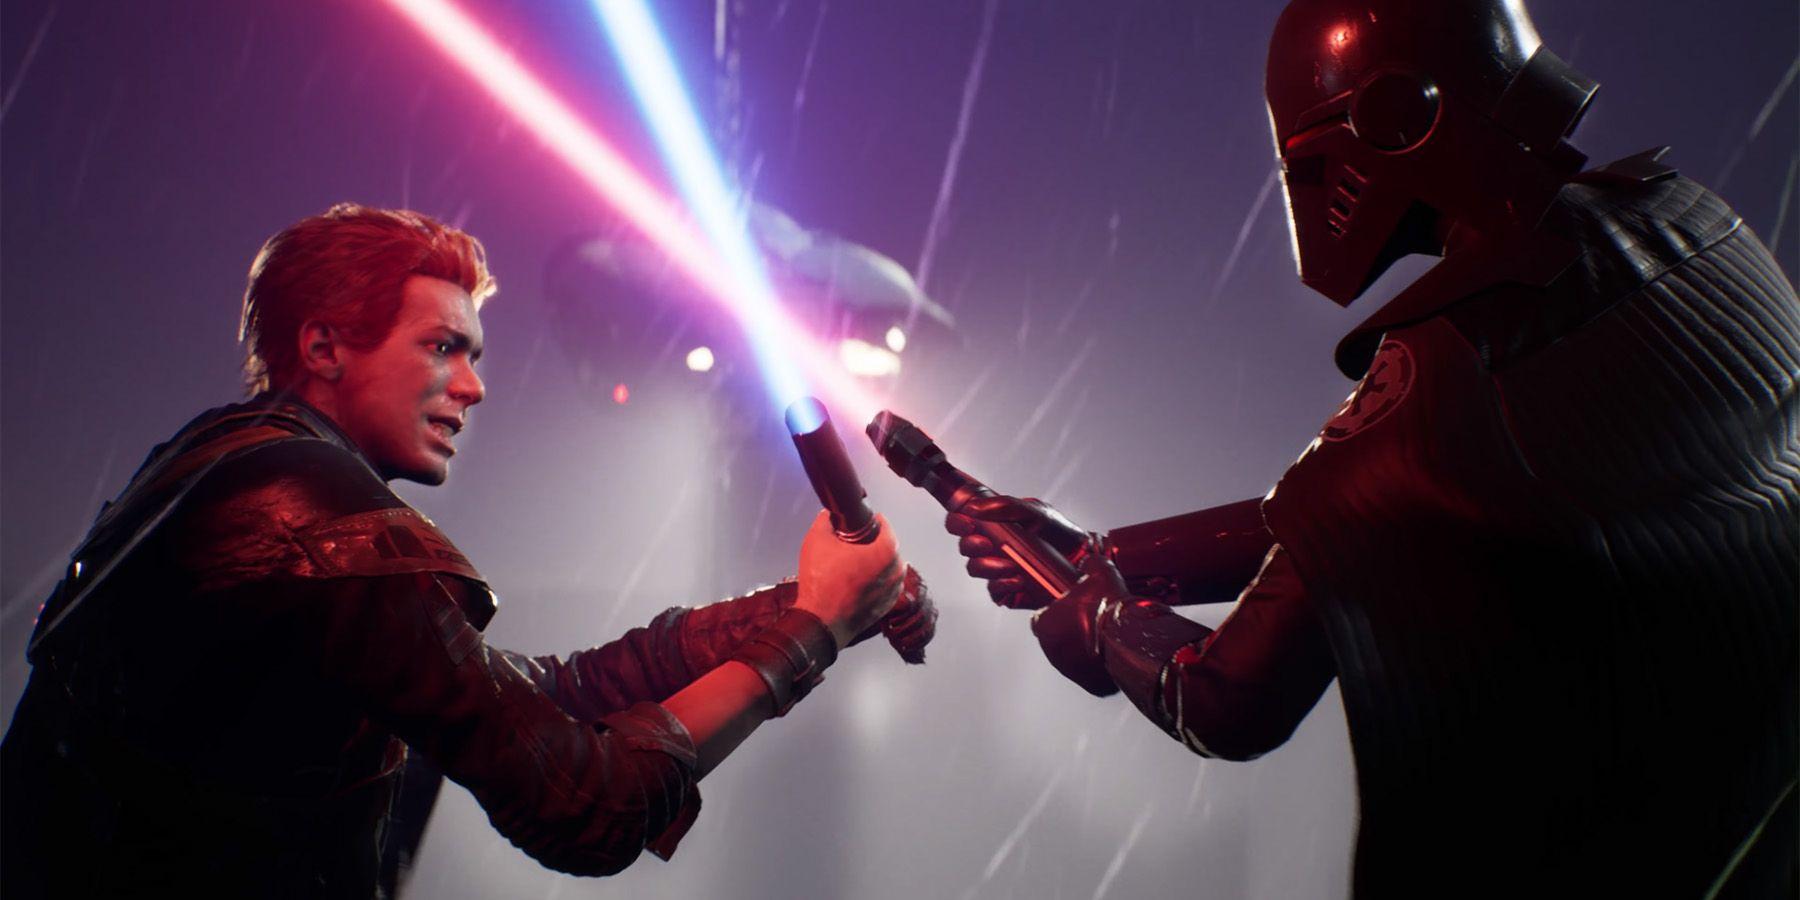 Star Wars Jedi: Fallen Order Trailer Teases Cal's Mission | CBR